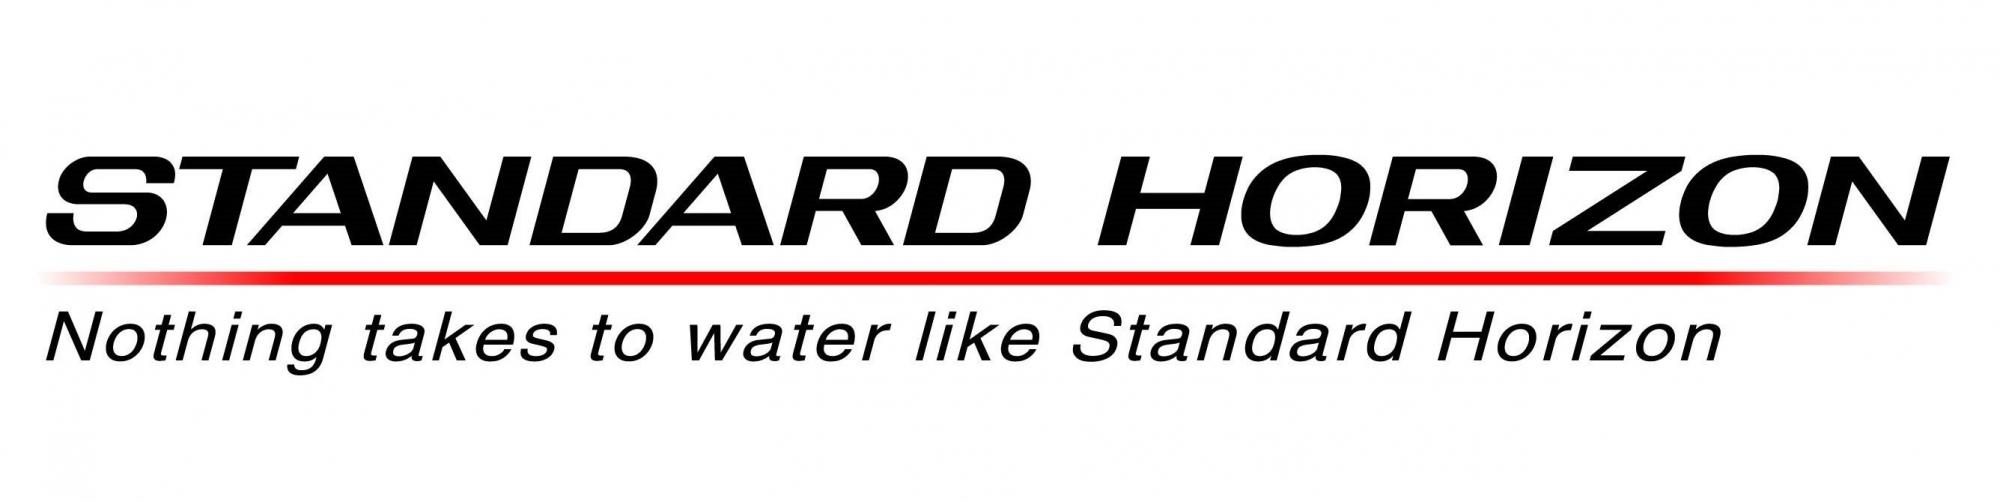 Standard Horizon - Digital Skipper